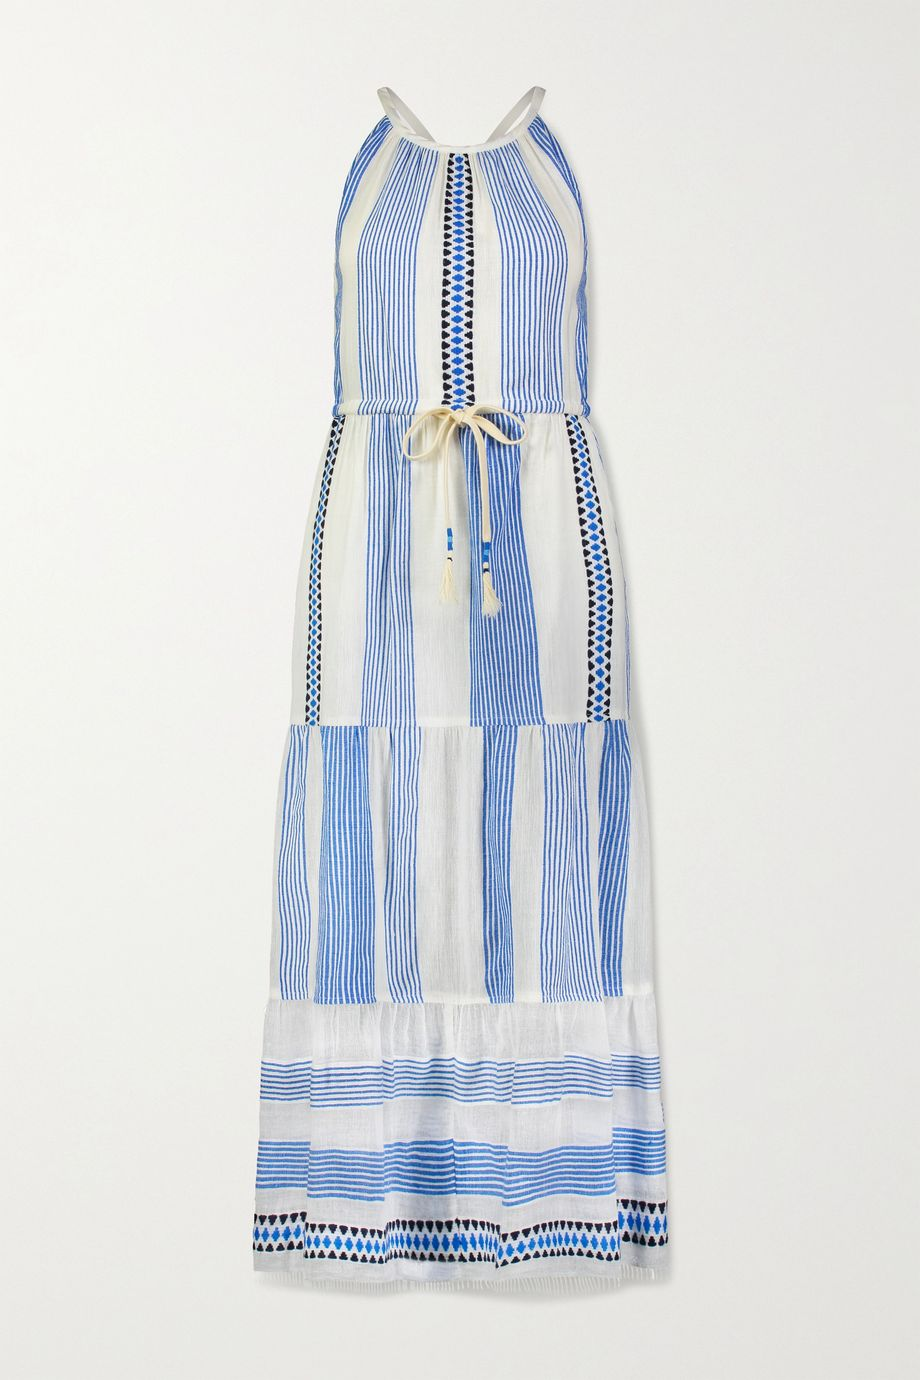 LemLem Mizan 流苏提花边饰条纹棉质混纺薄纱连衣裙